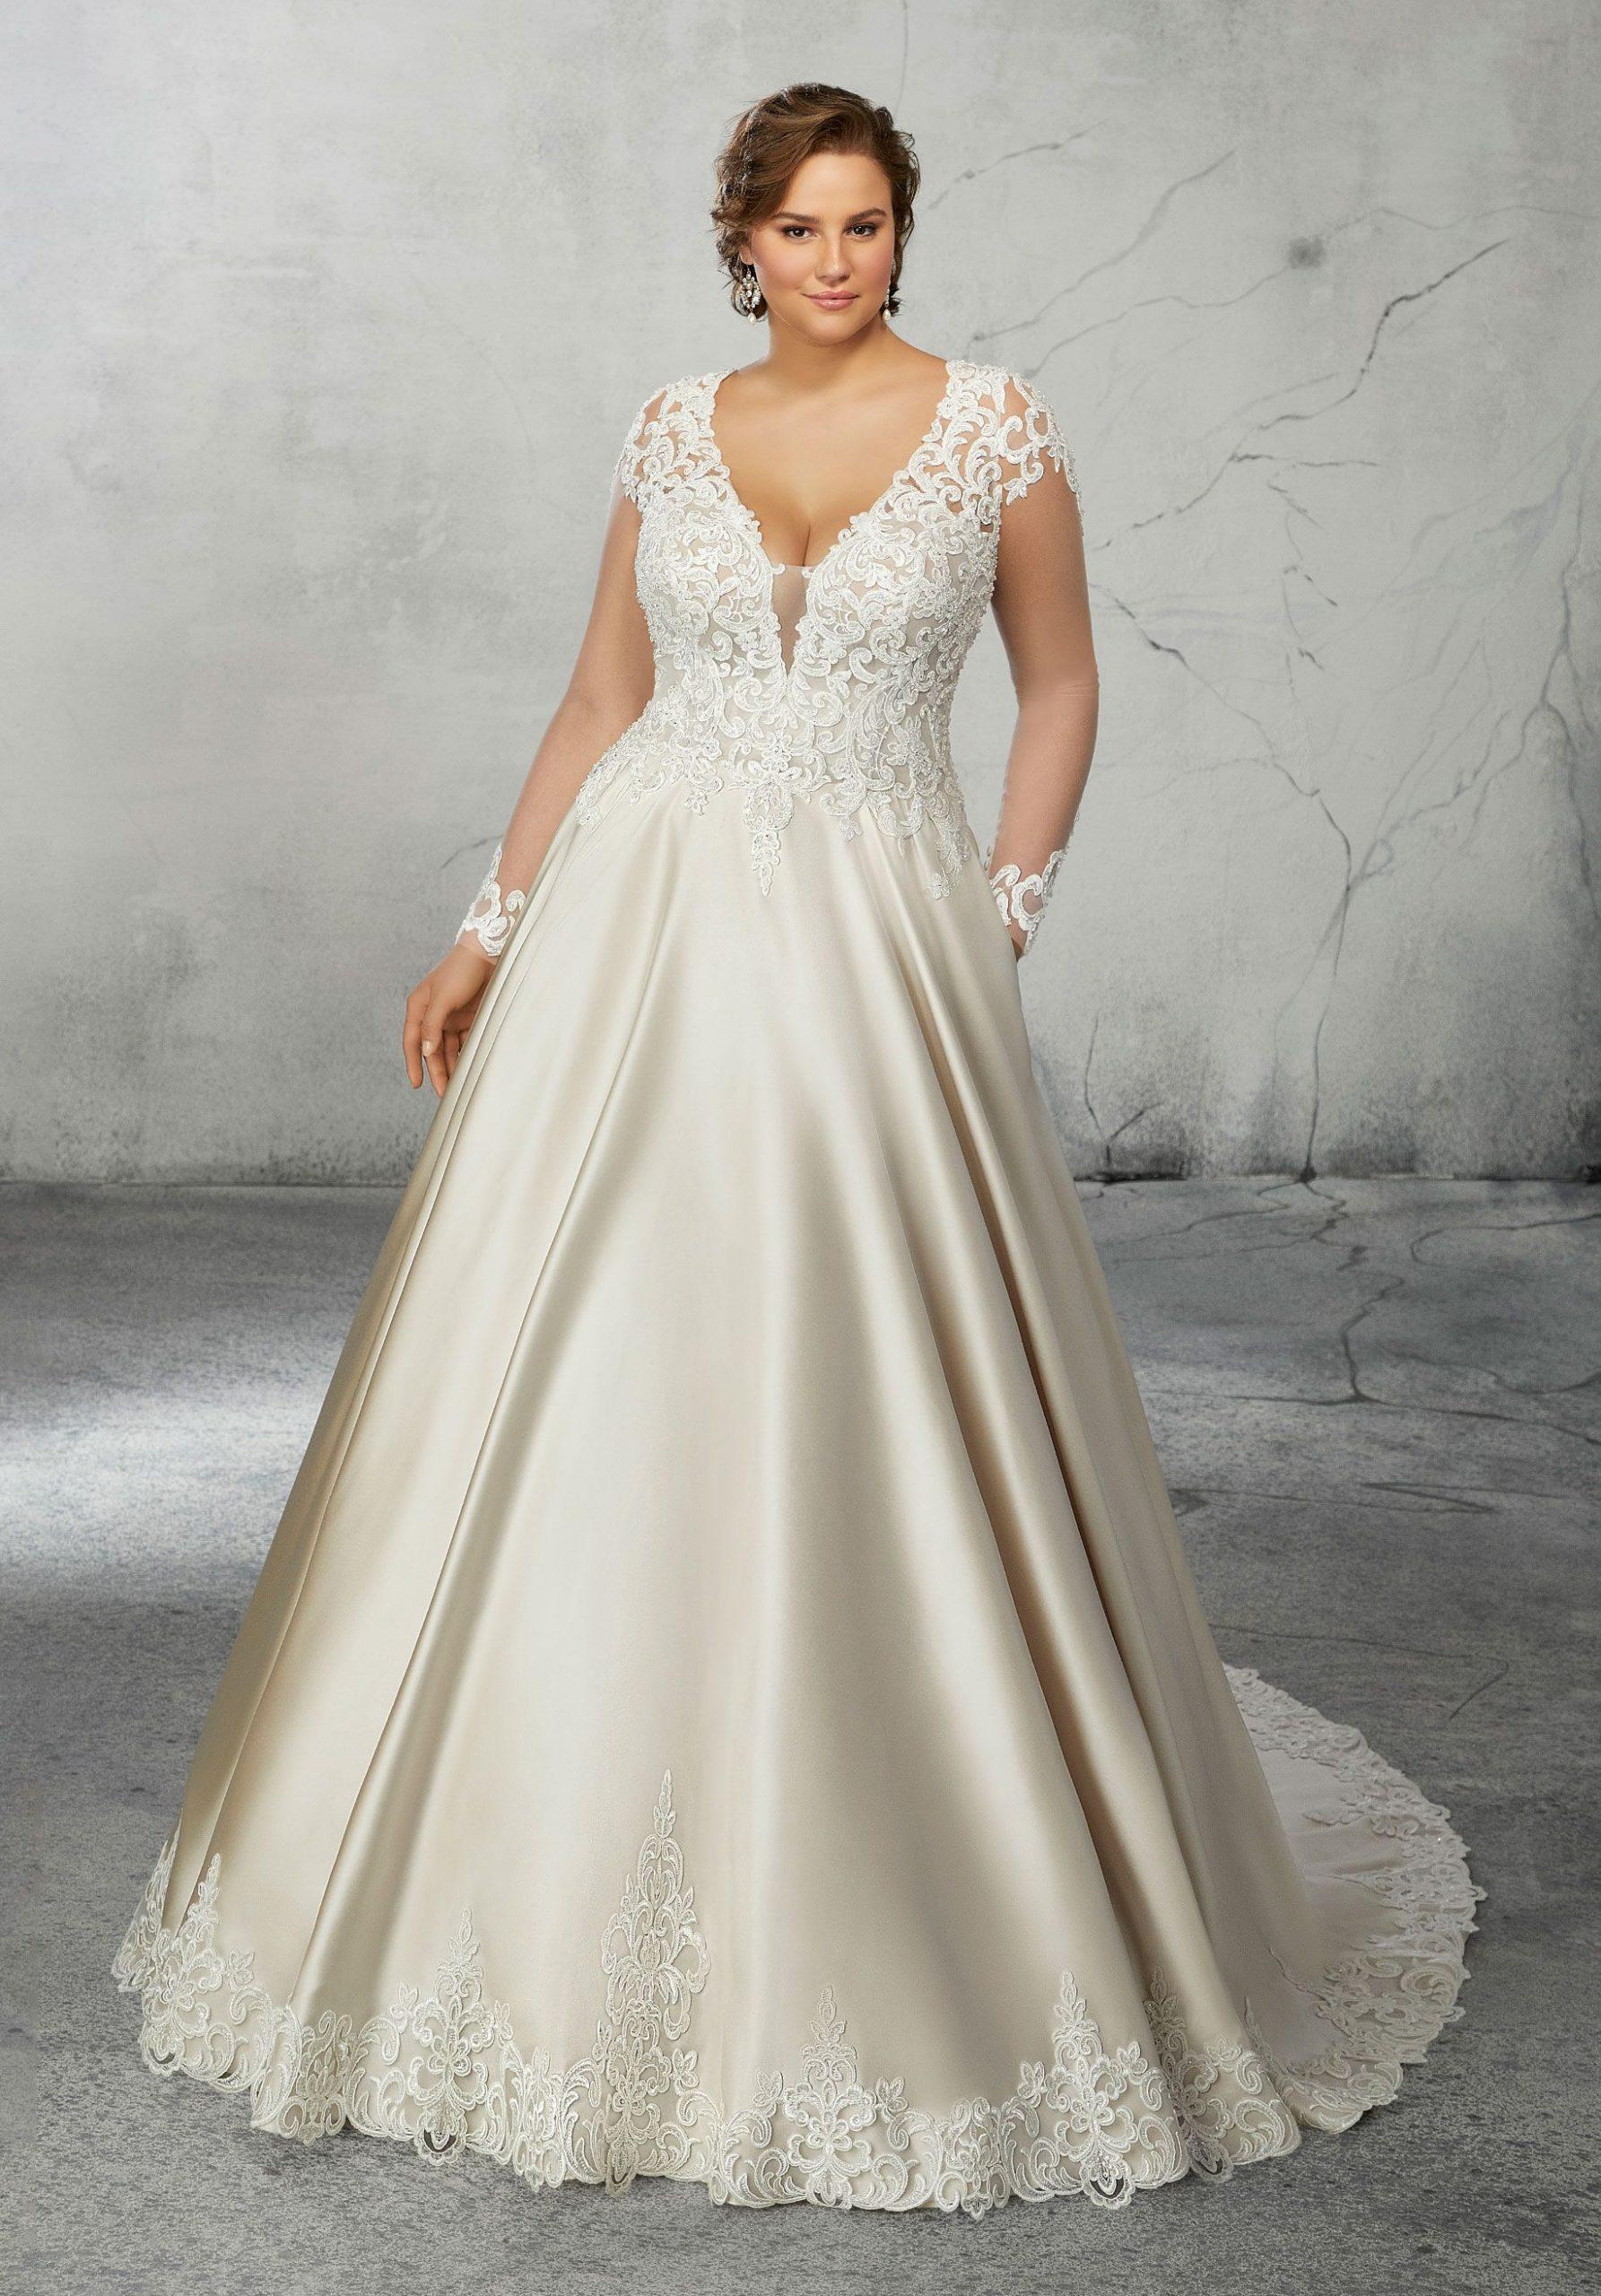 Reina Wedding Dress | Morilee | Hochzeitskleid, Brautkleid